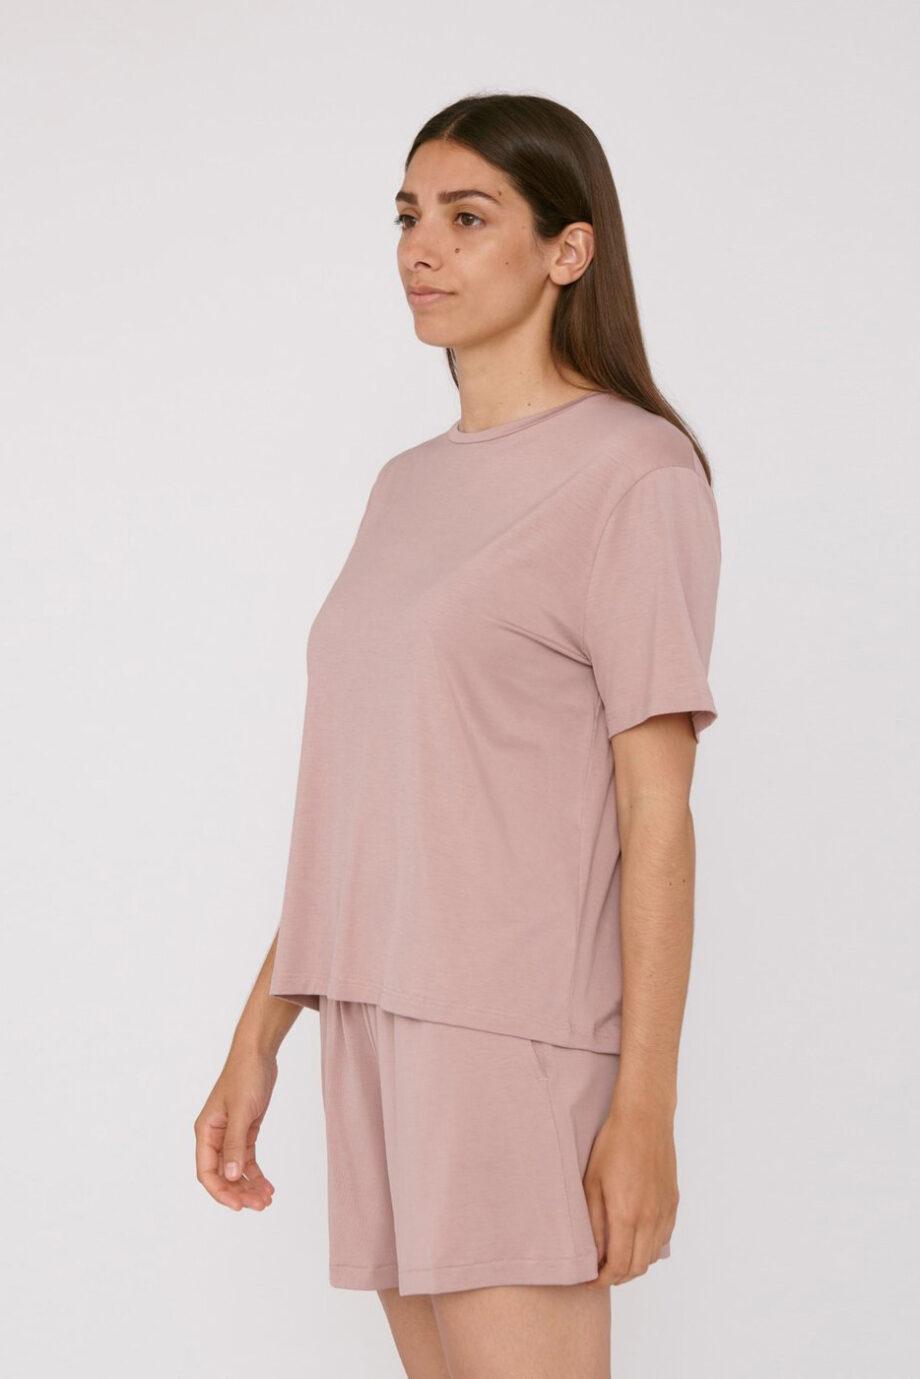 Organic Basics - T-shirt Tencel– Oud Roze_side